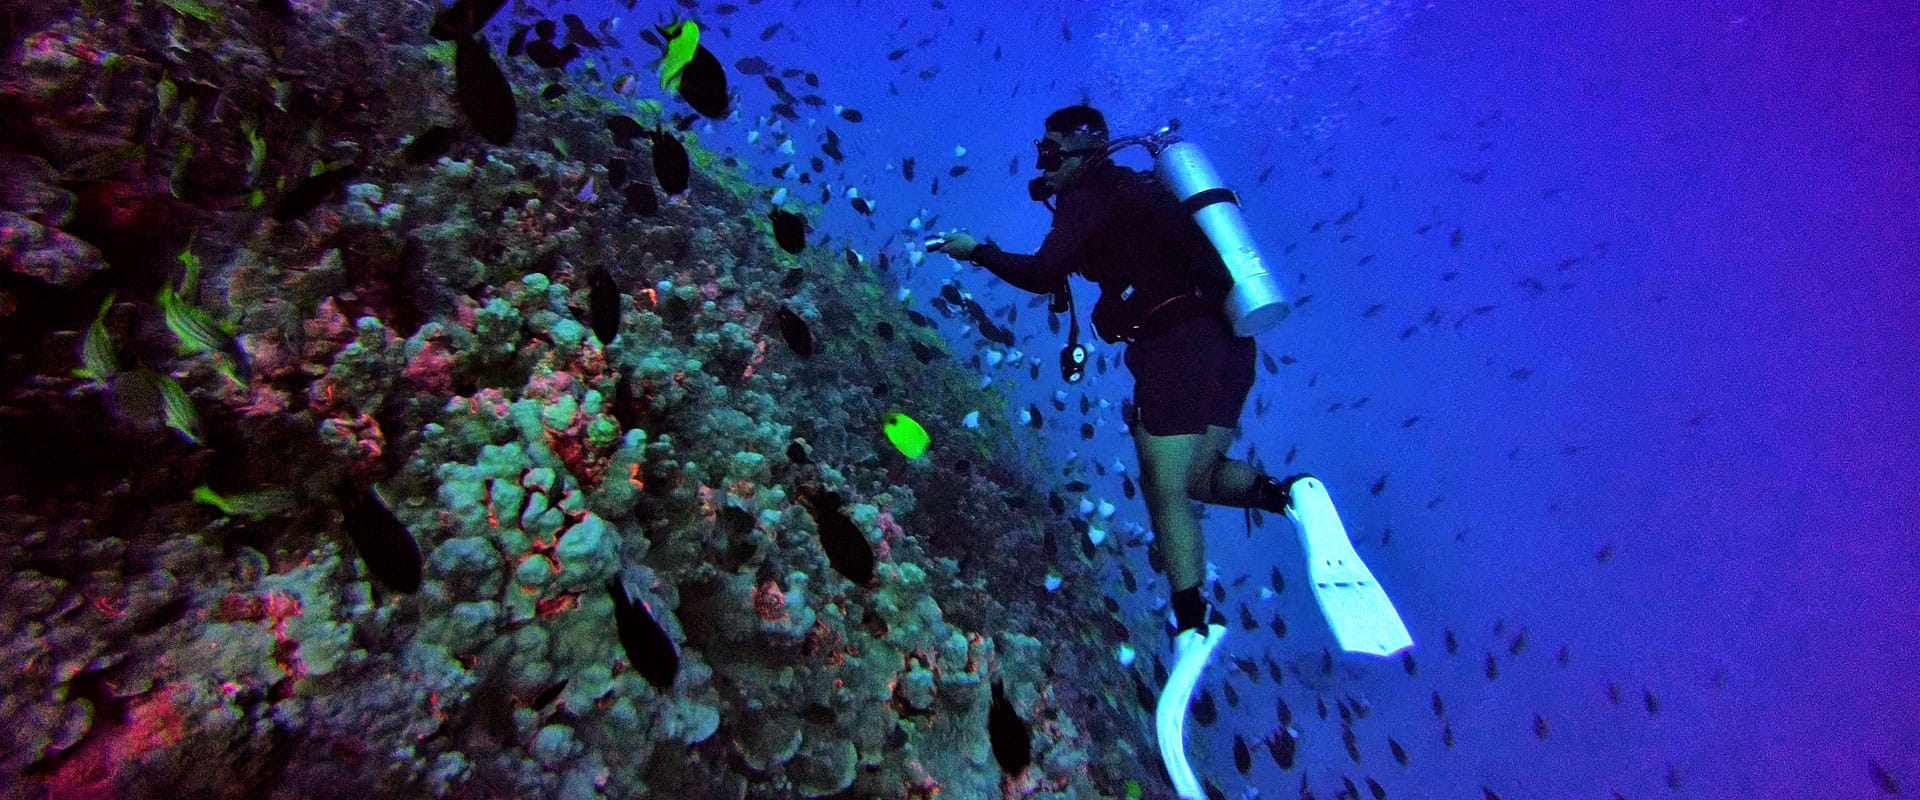 Discover Oahu's Coastal Marine Life Unique to the Hawaiian Islands